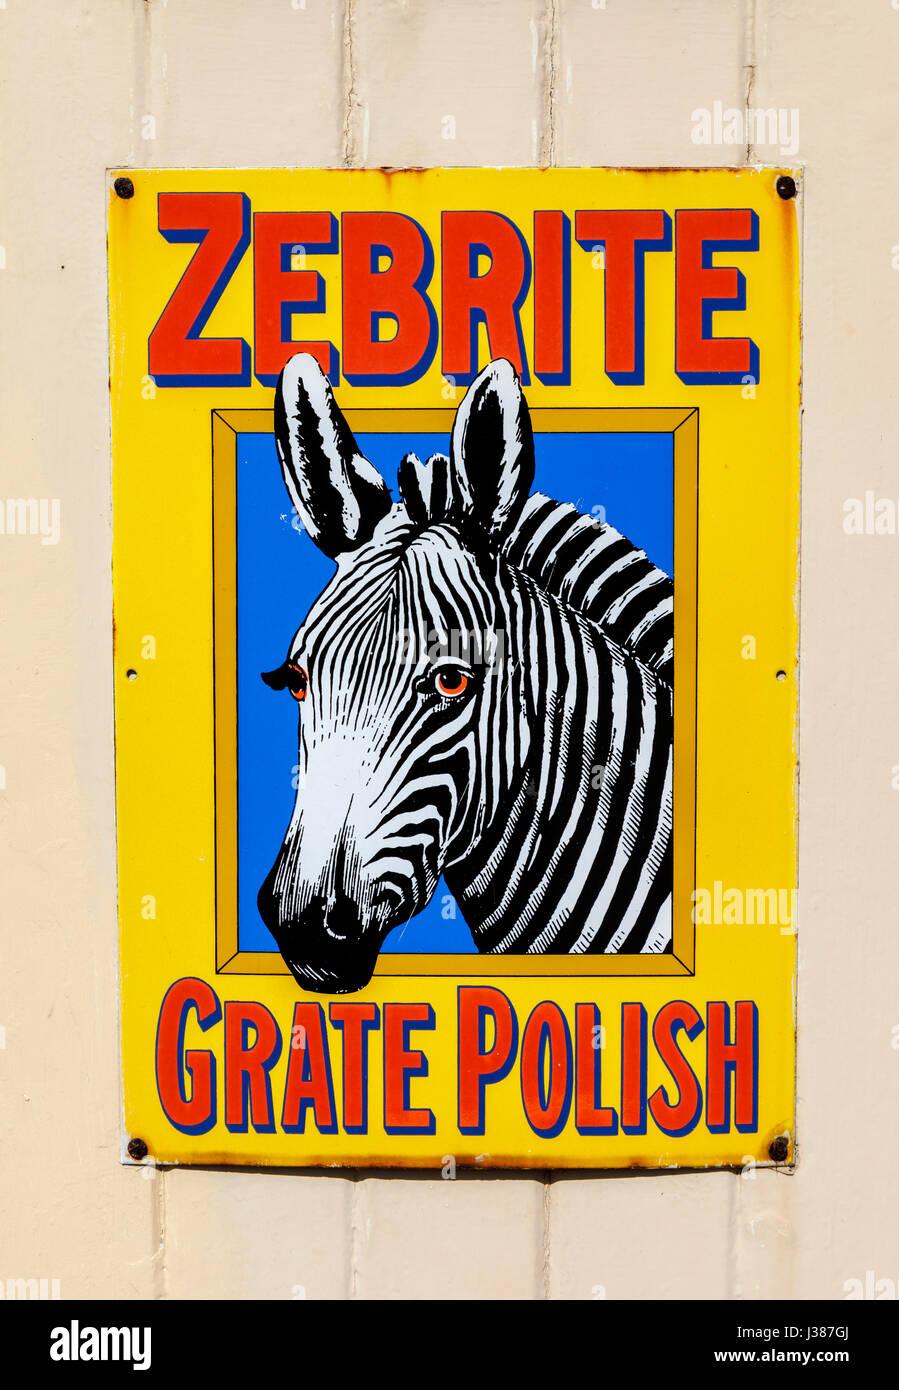 Old-fashioned, vintage metallic tin advertisement for Zebrite Grate Polish at Tenterden Town Station, Tenterden, - Stock Image